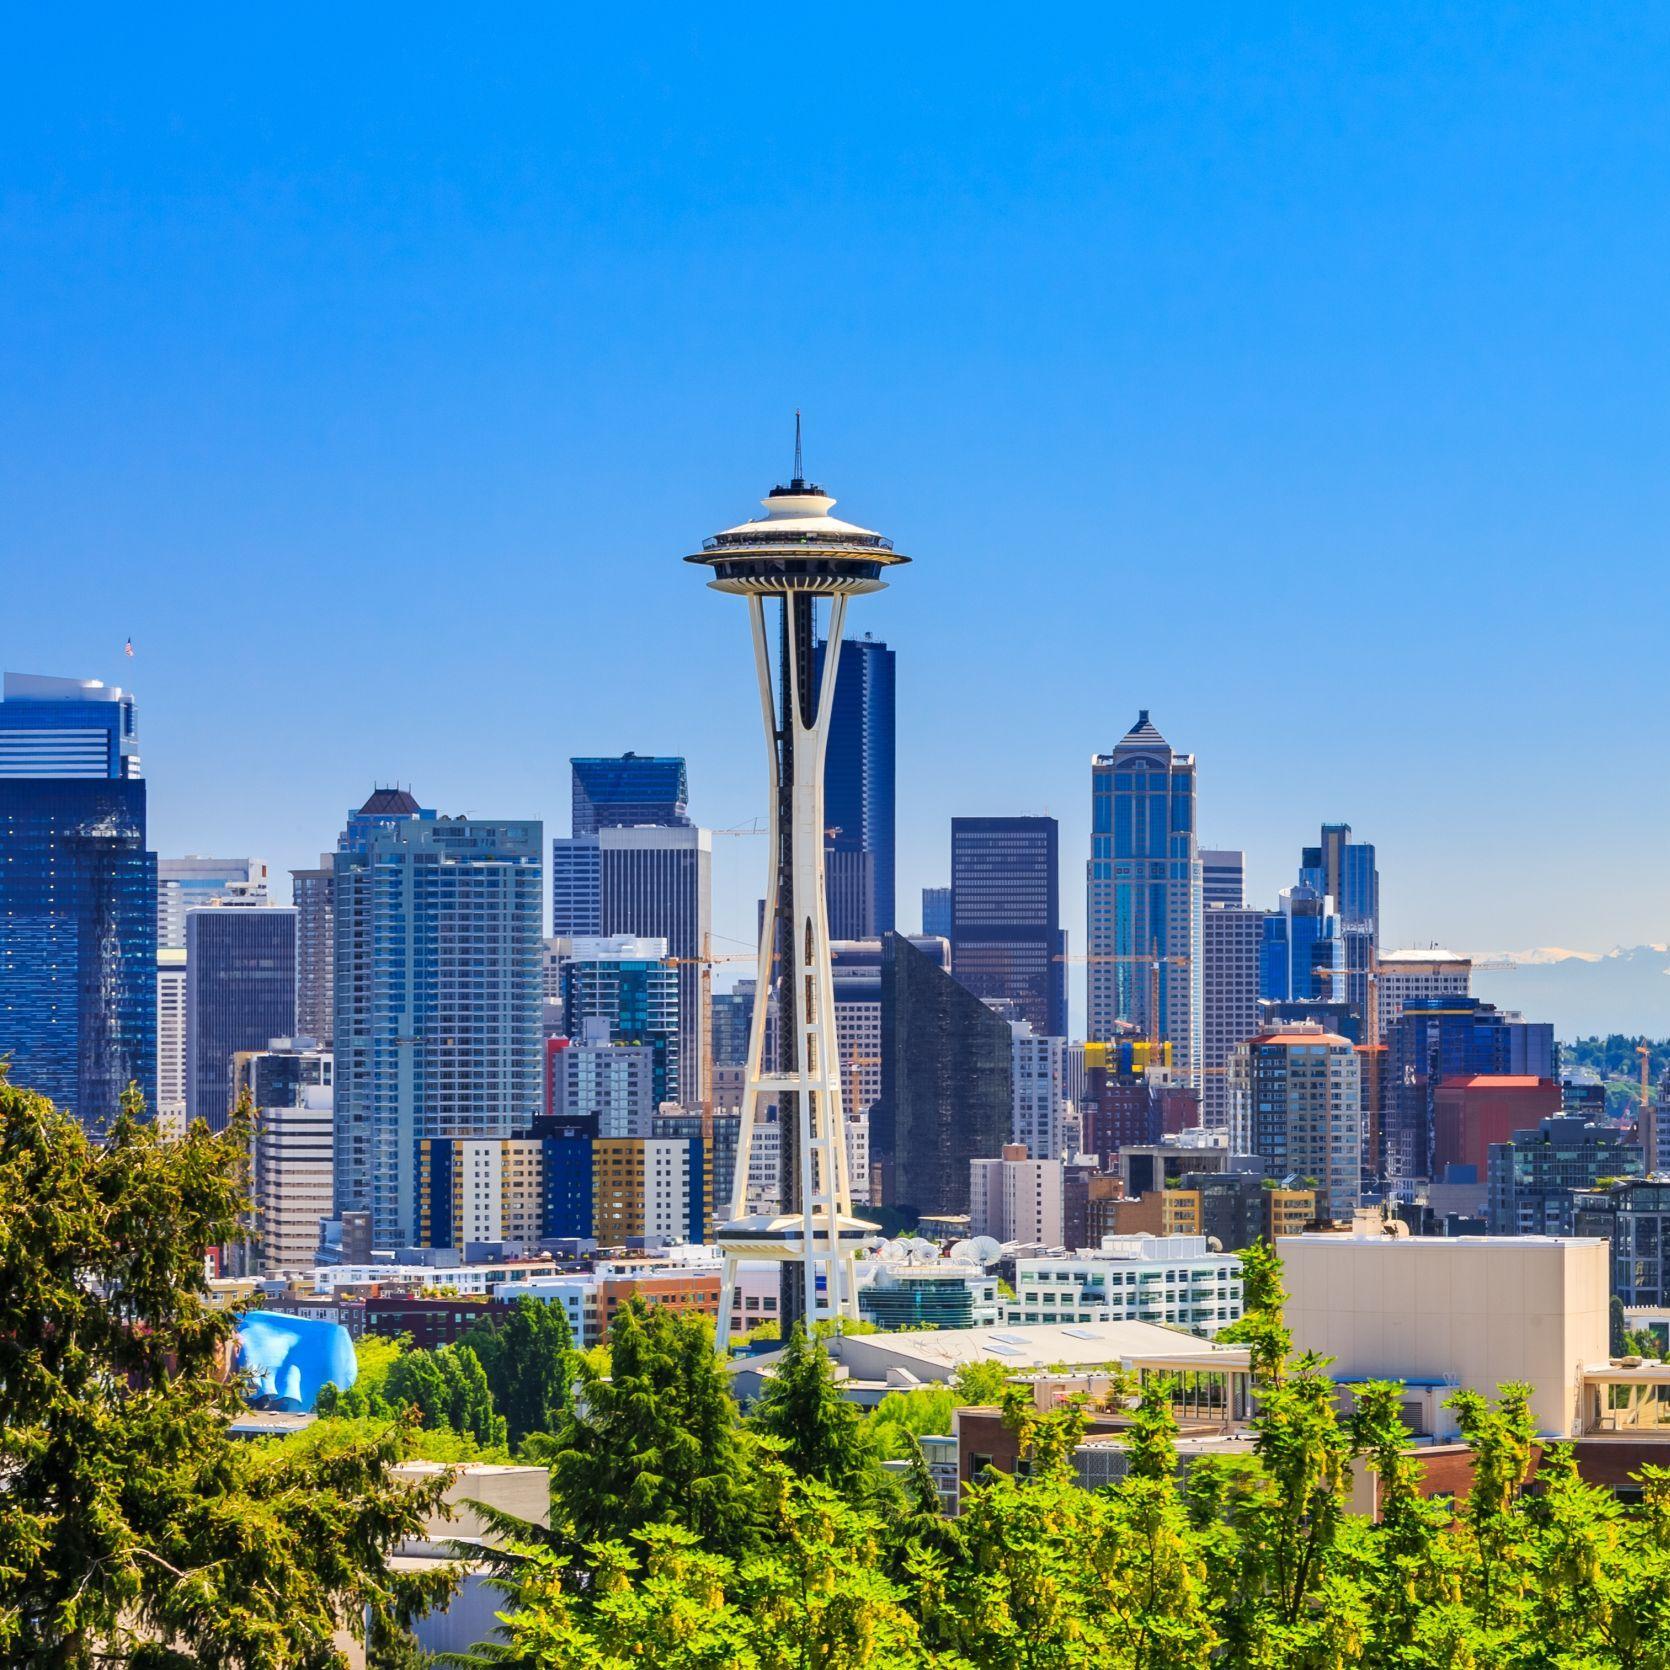 Flüge: Seattle, USA [bis Mai 2022] Hin- & Rückflug ab Amsterdam mit American Airlines ab 218€